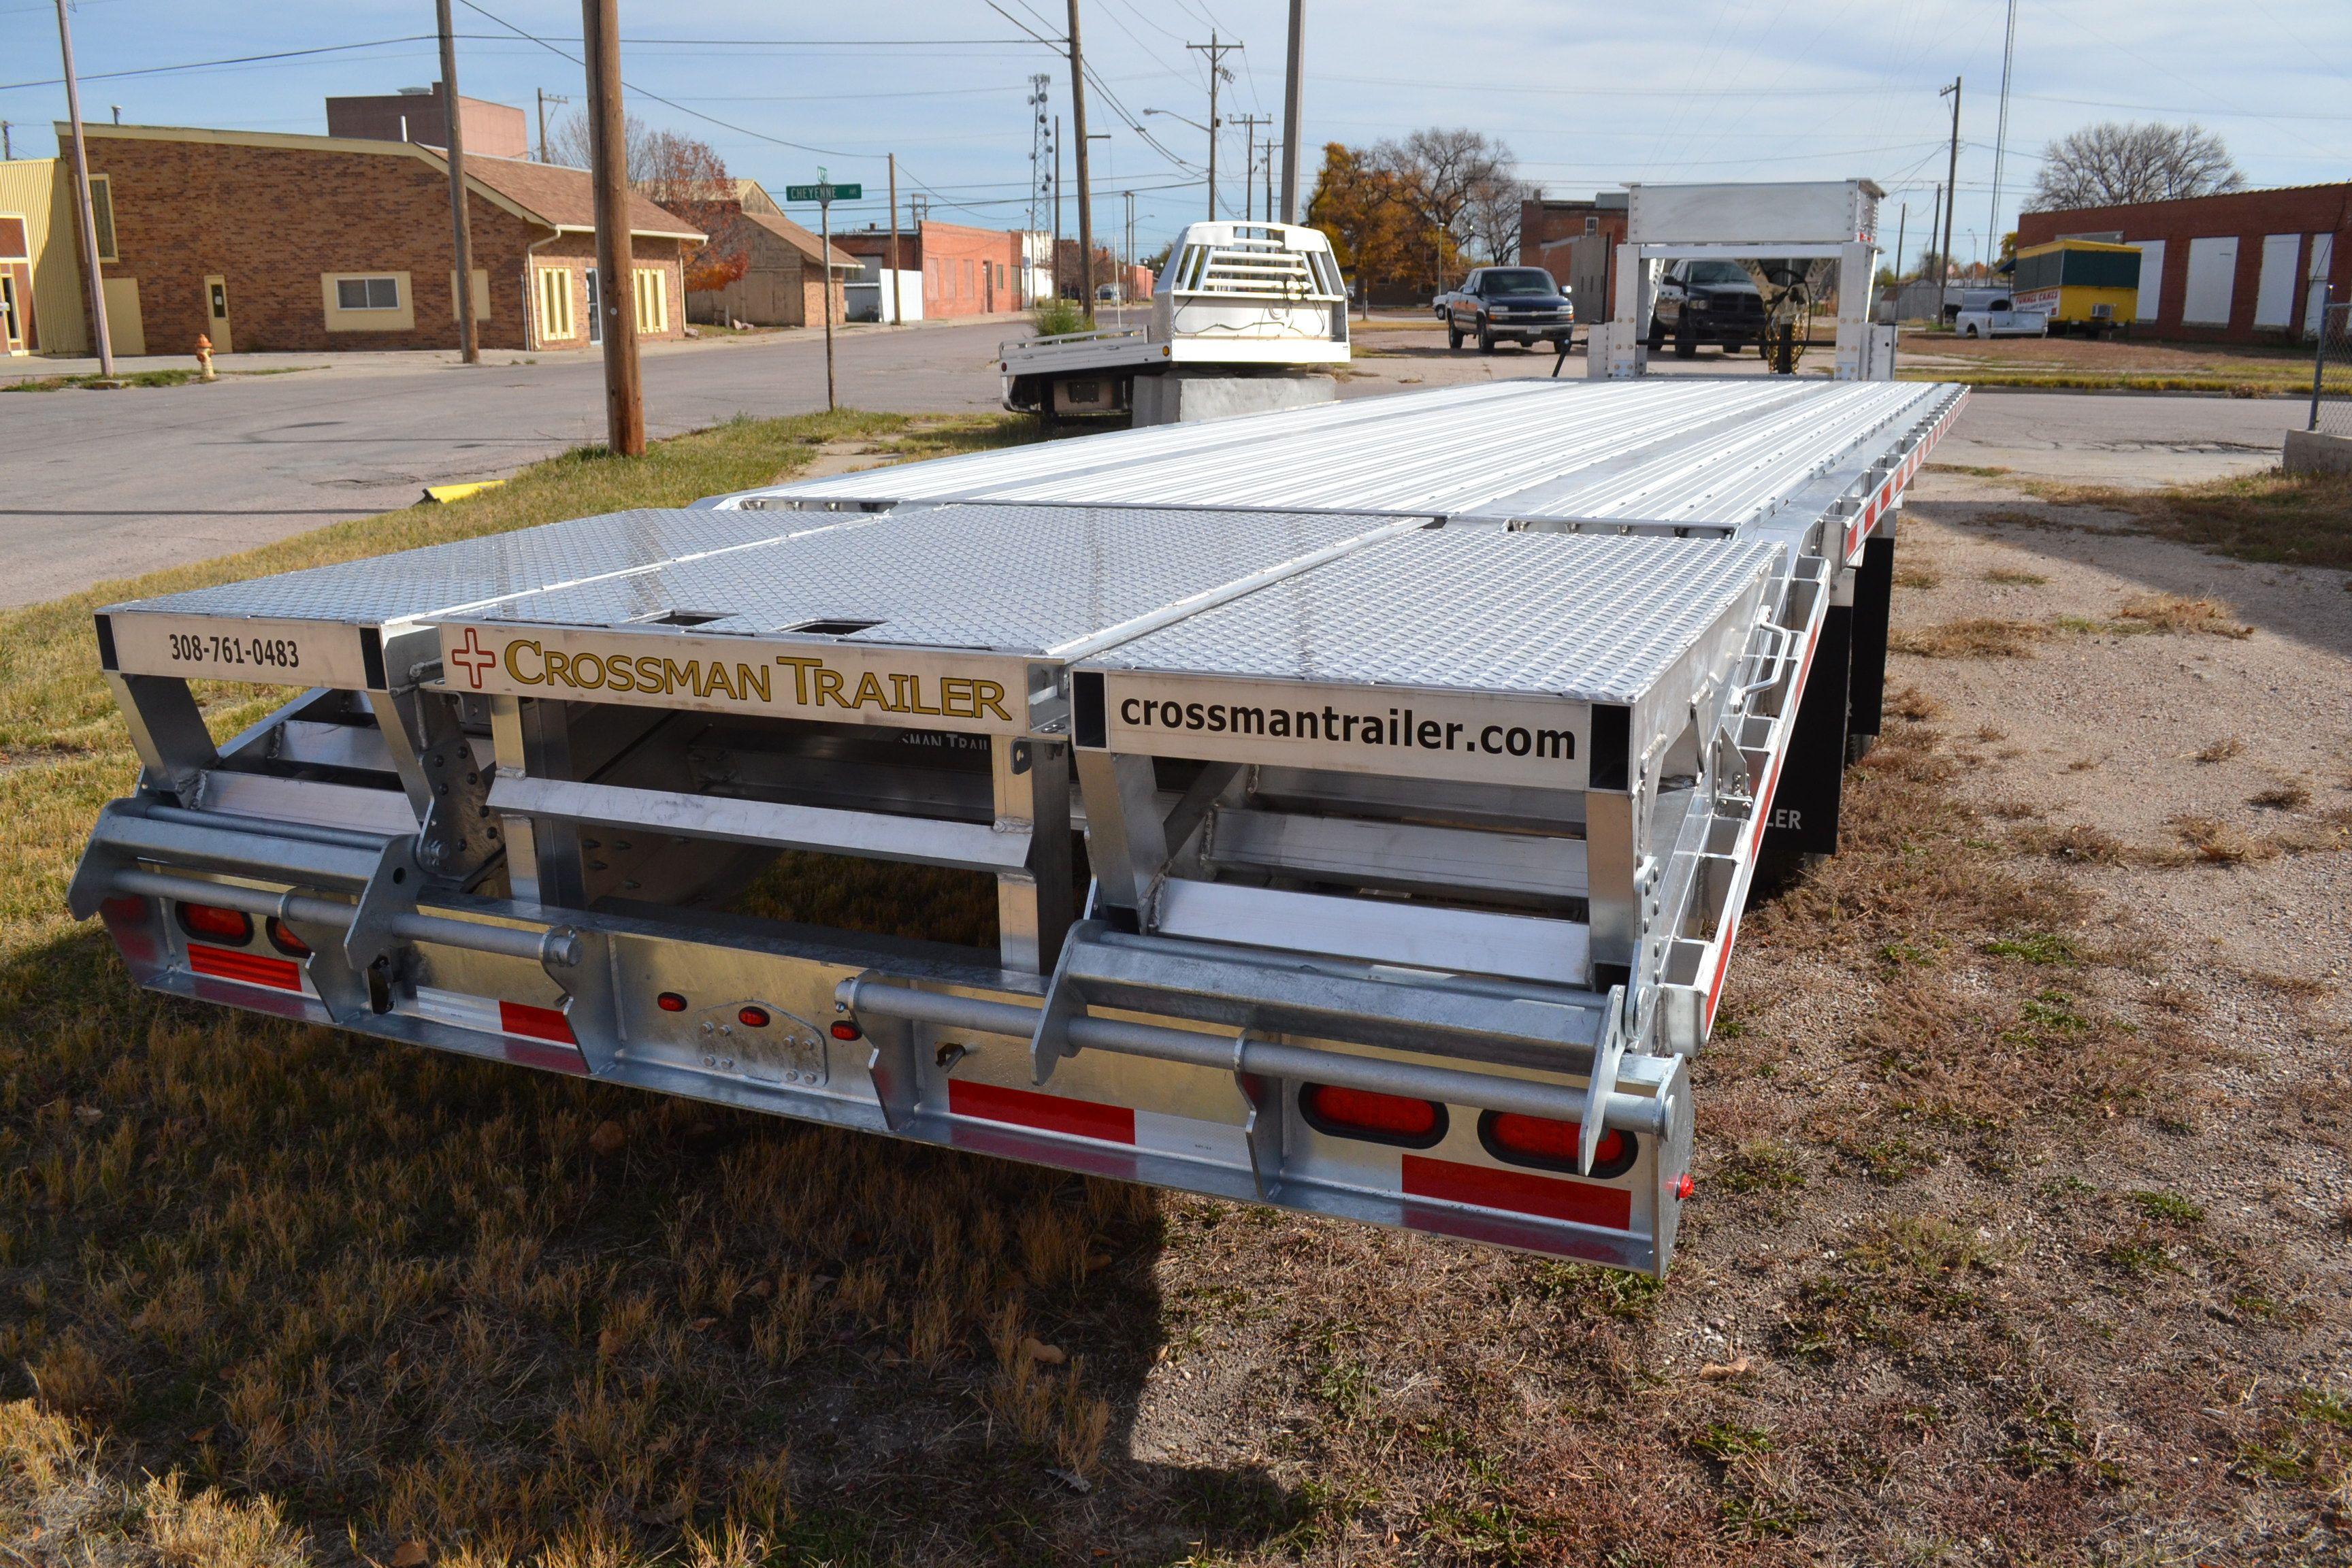 Roll Off Dump Trailers Wiring Diagram For Texas Pride Library Load Trail Trailer Crossman 25 5 Aluminum Gooseneck Flatbed Diesel